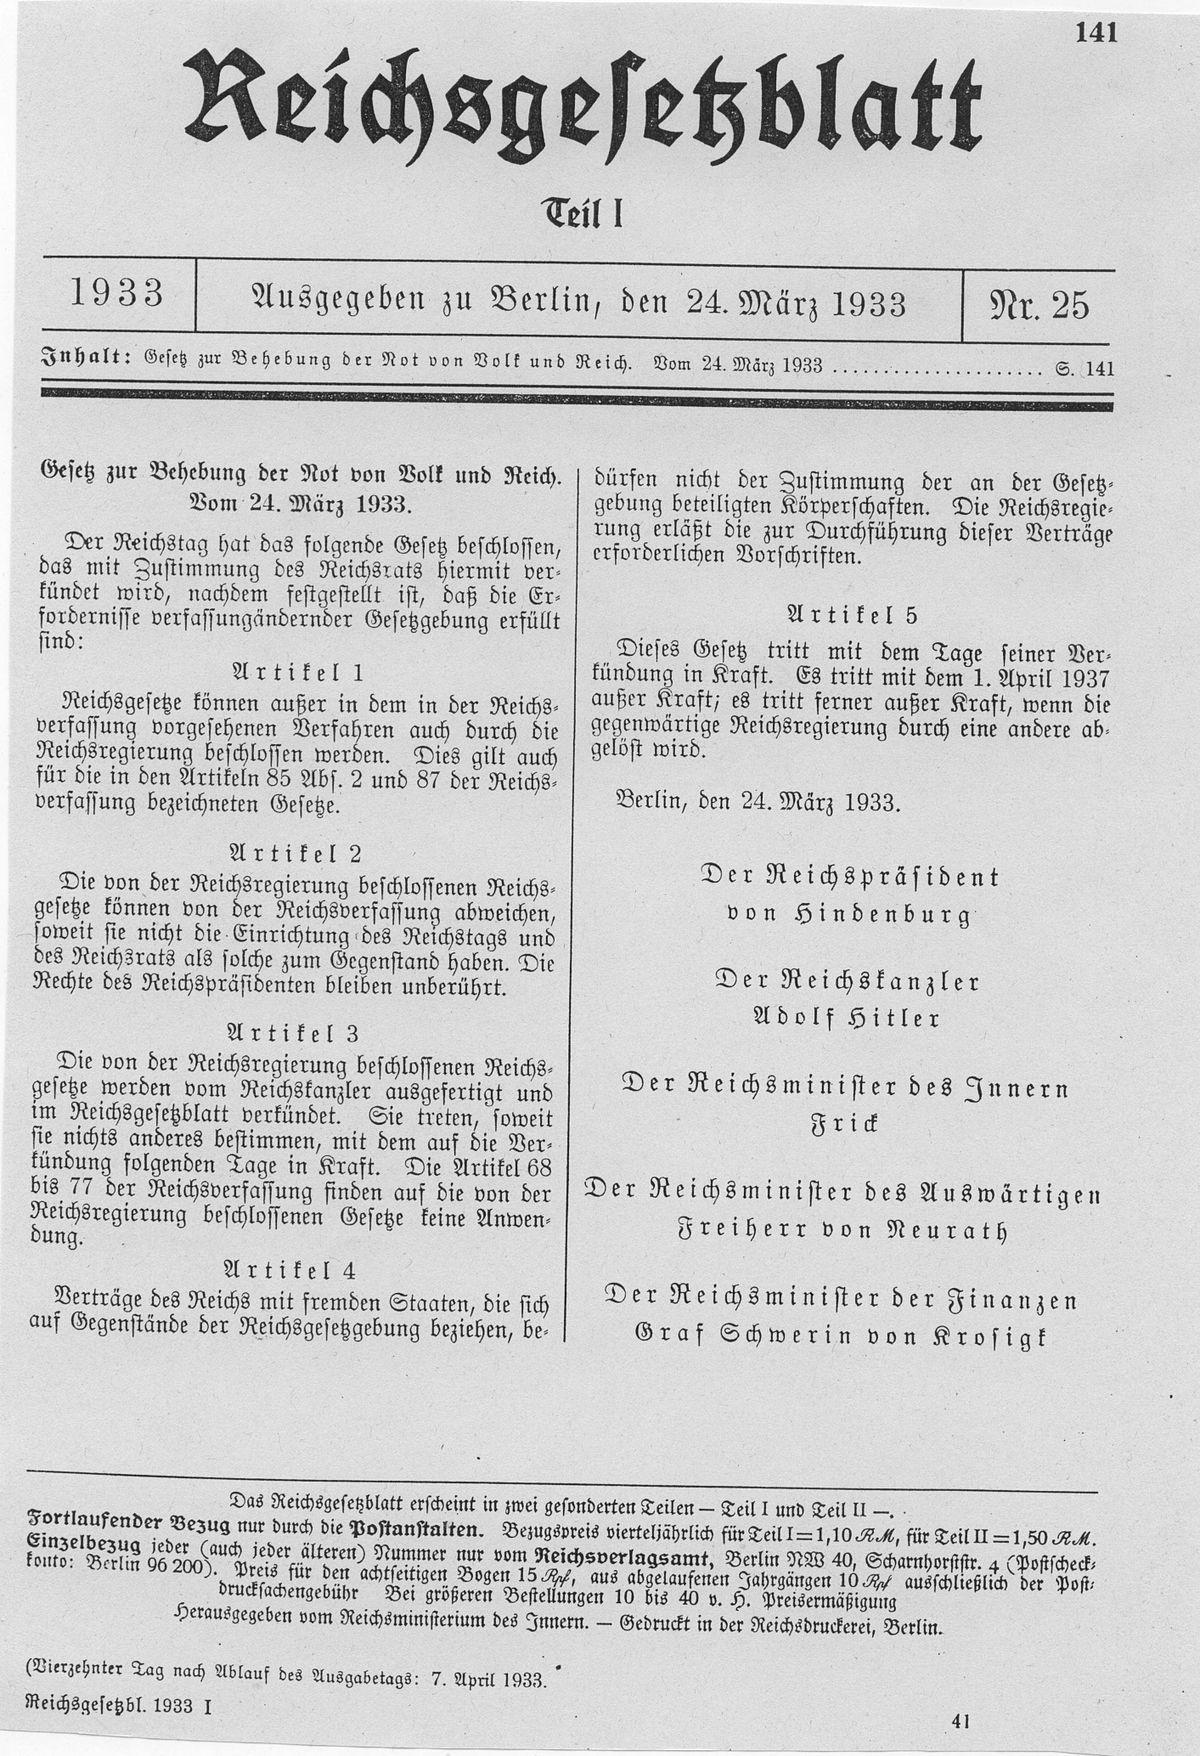 Ley Habilitante de 1933